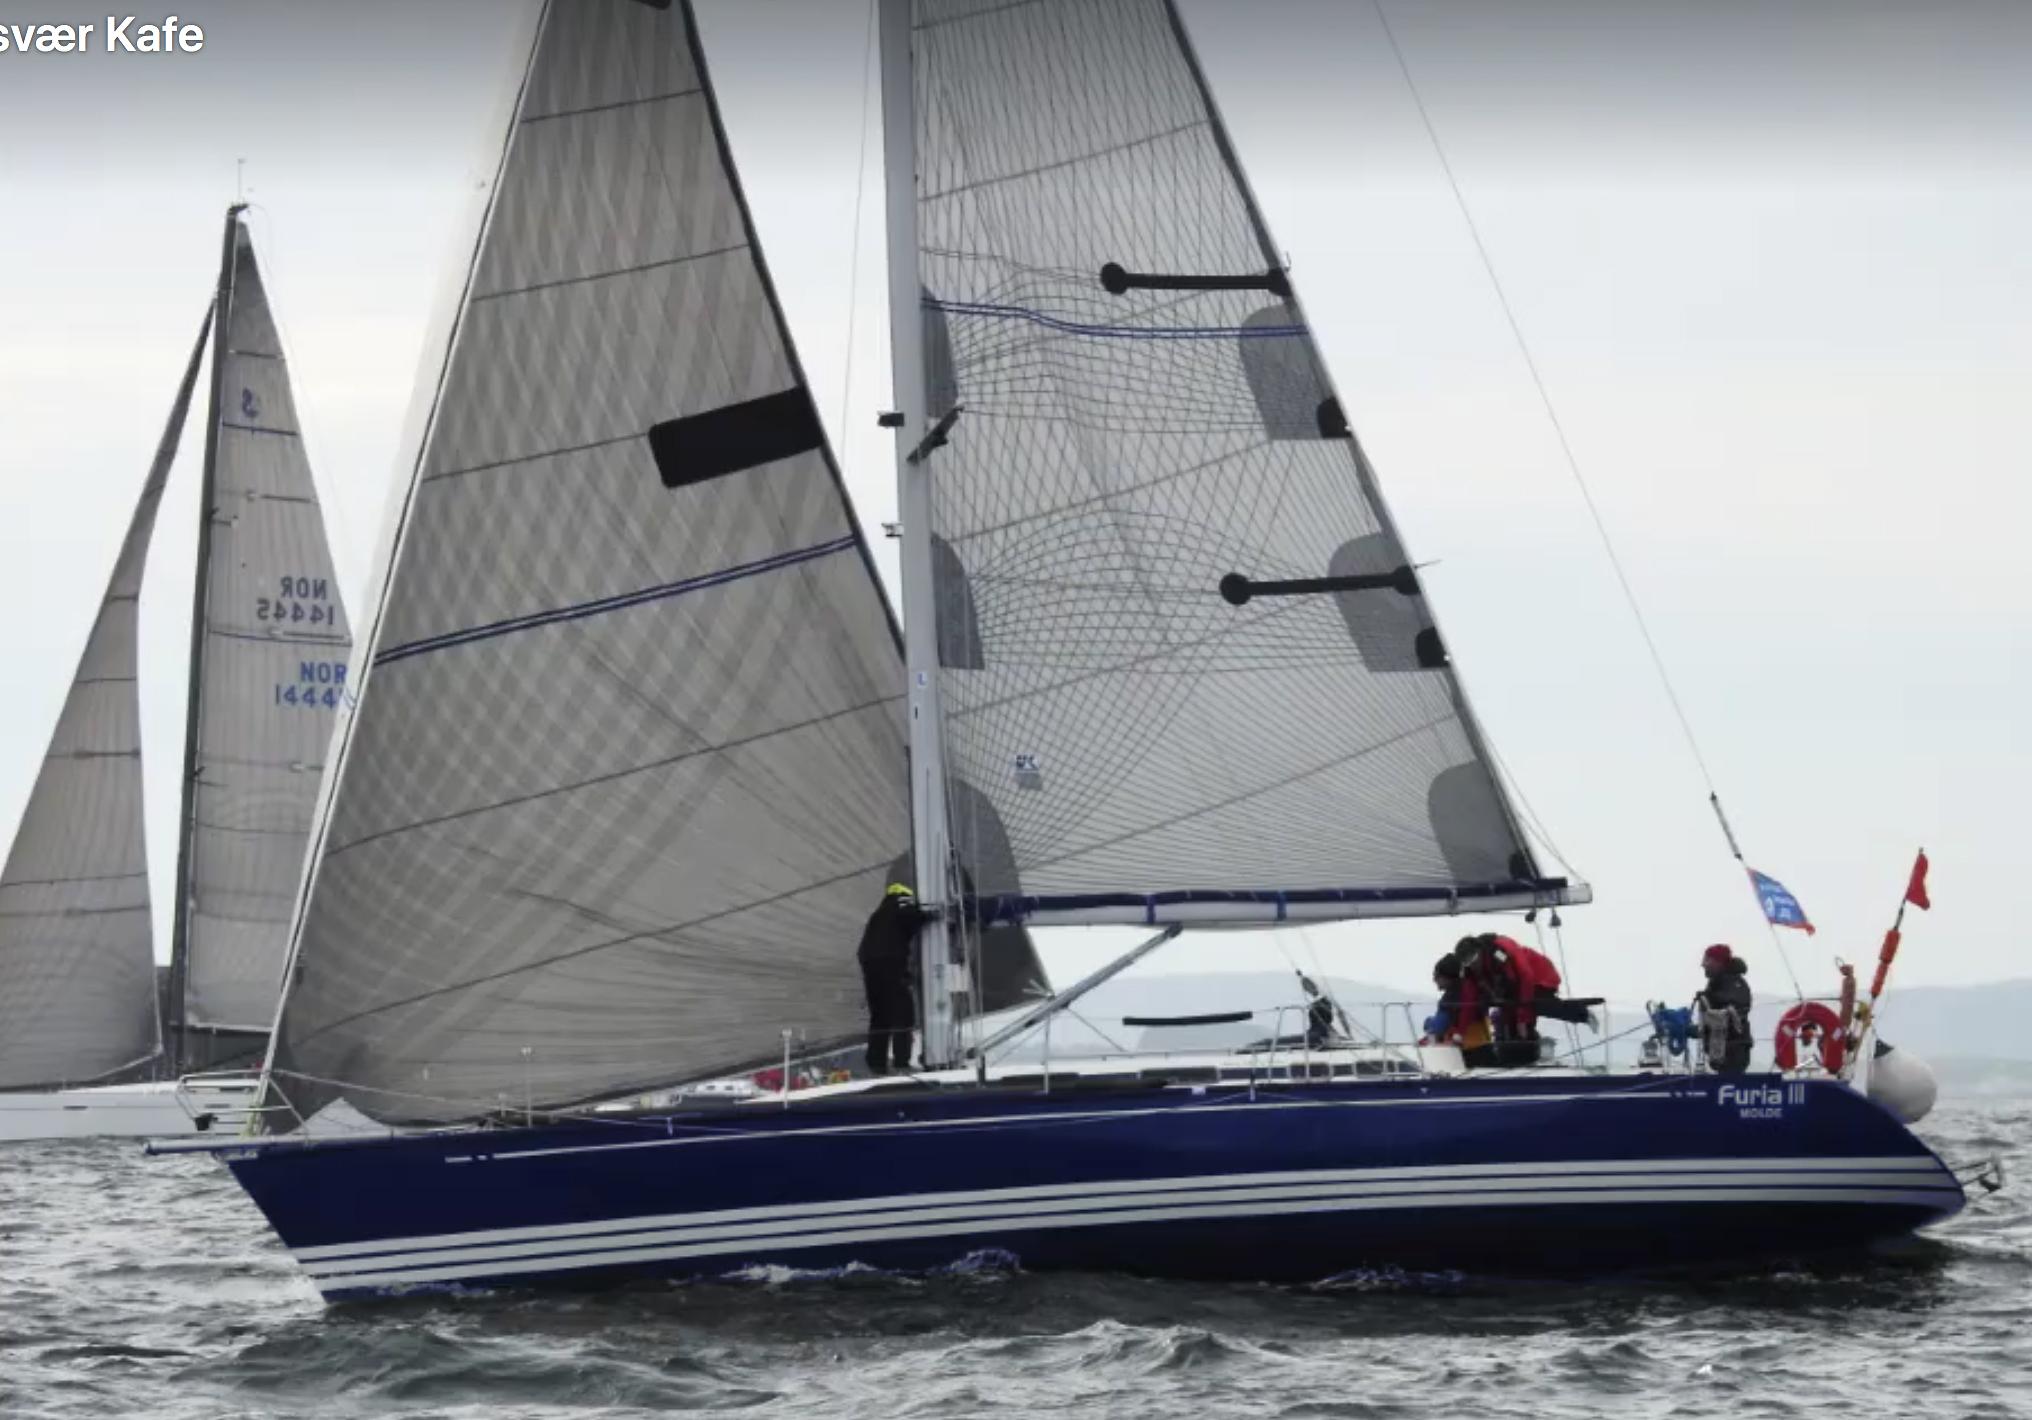 X442- FURIA III, winner of Class 4